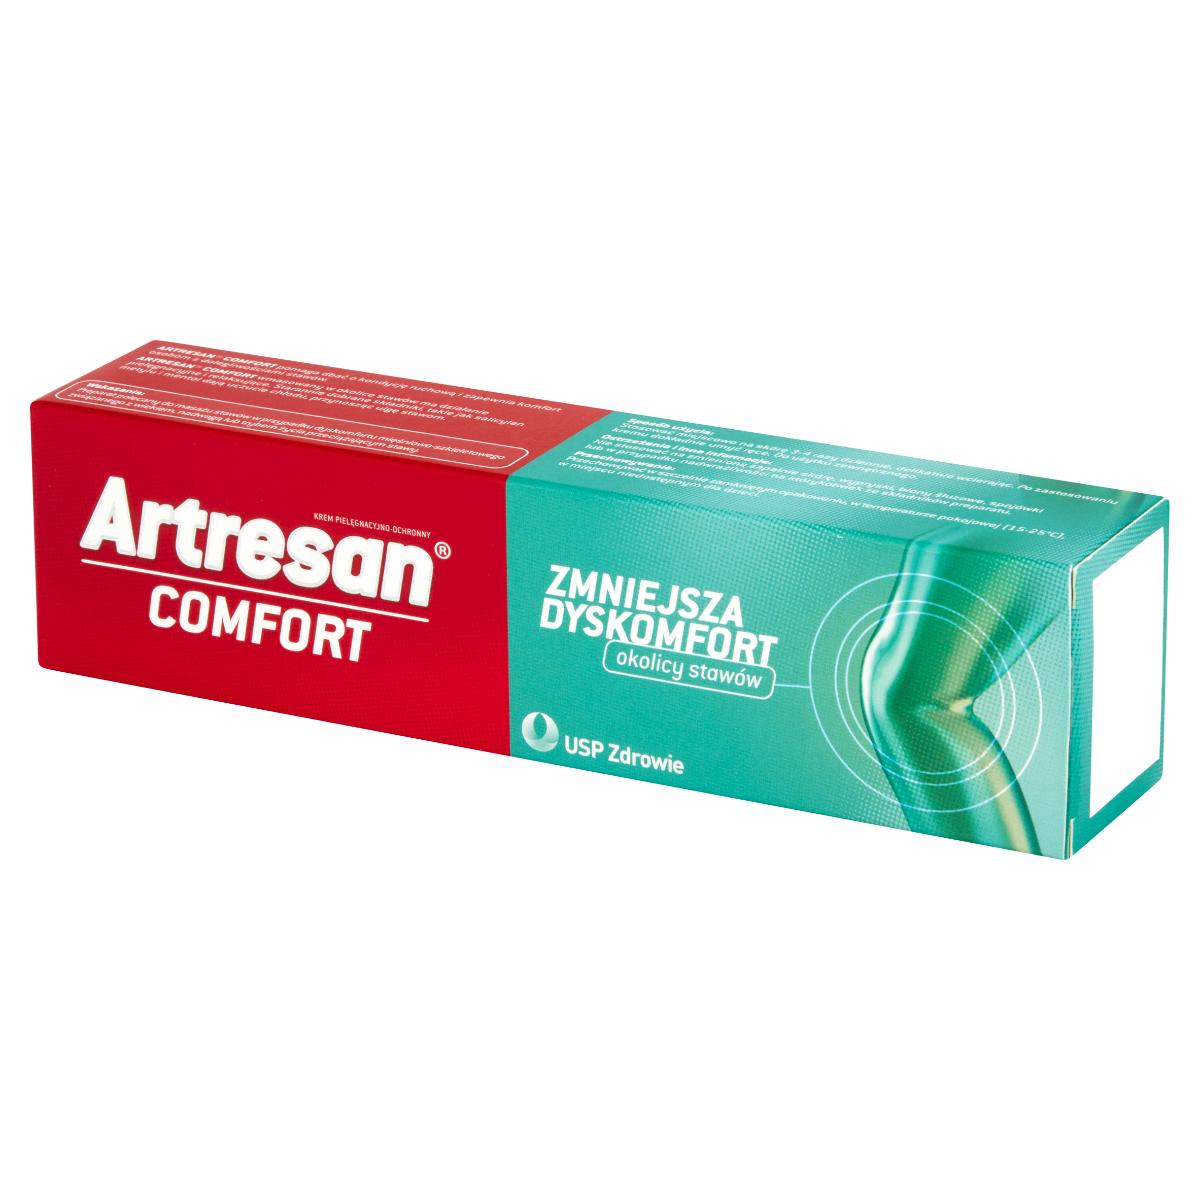 Artresan Comfort - krem